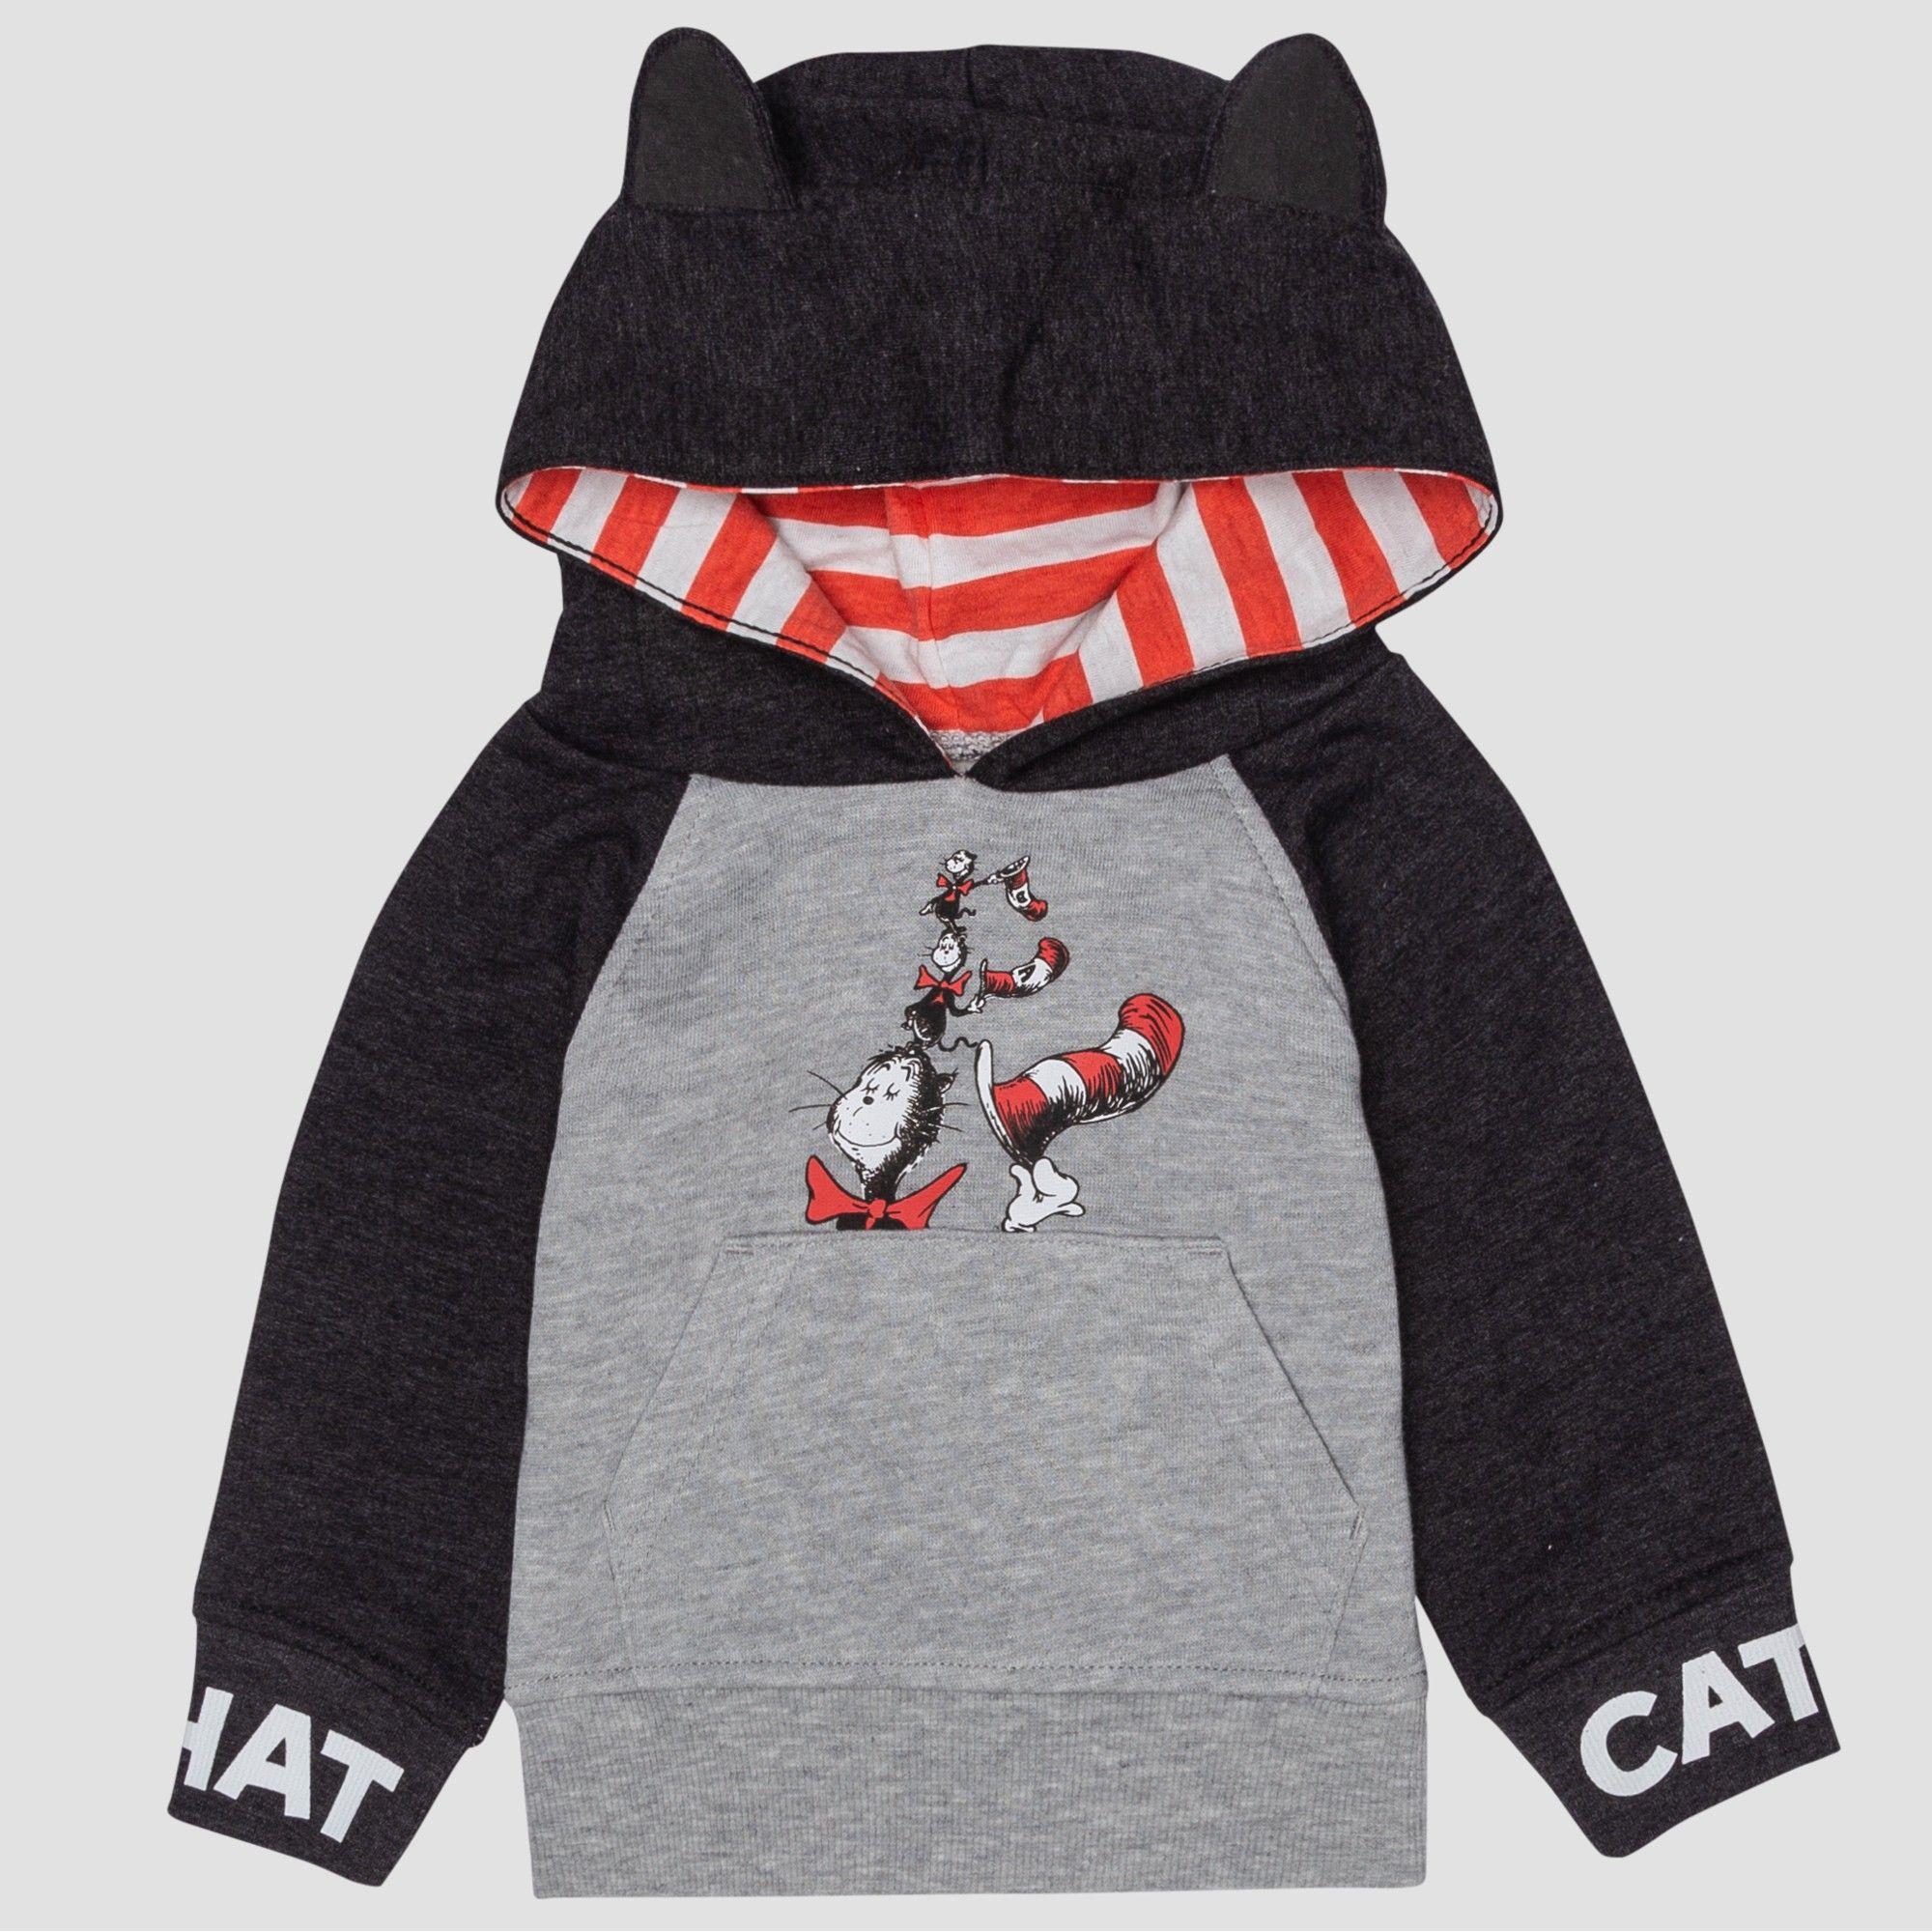 Baby S Dr Seuss Cat In The Hat Hooded Sweatshirt Gray 6 9m Infant Unisex Hooded Sweatshirts Grey Sweatshirt Sweatshirts [ 2000 x 2000 Pixel ]